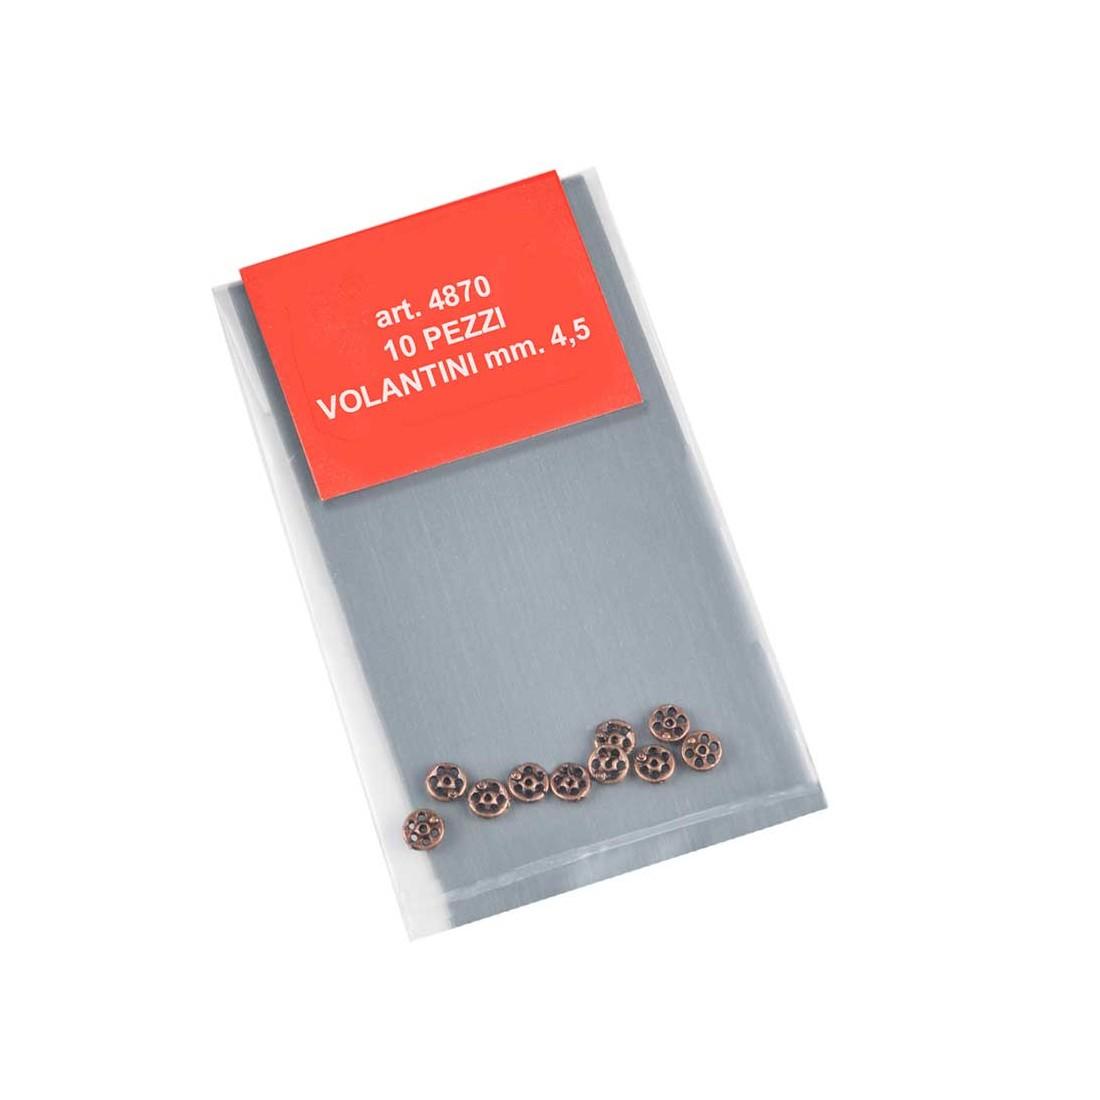 Ruedas manuales de metal mm.4,5.